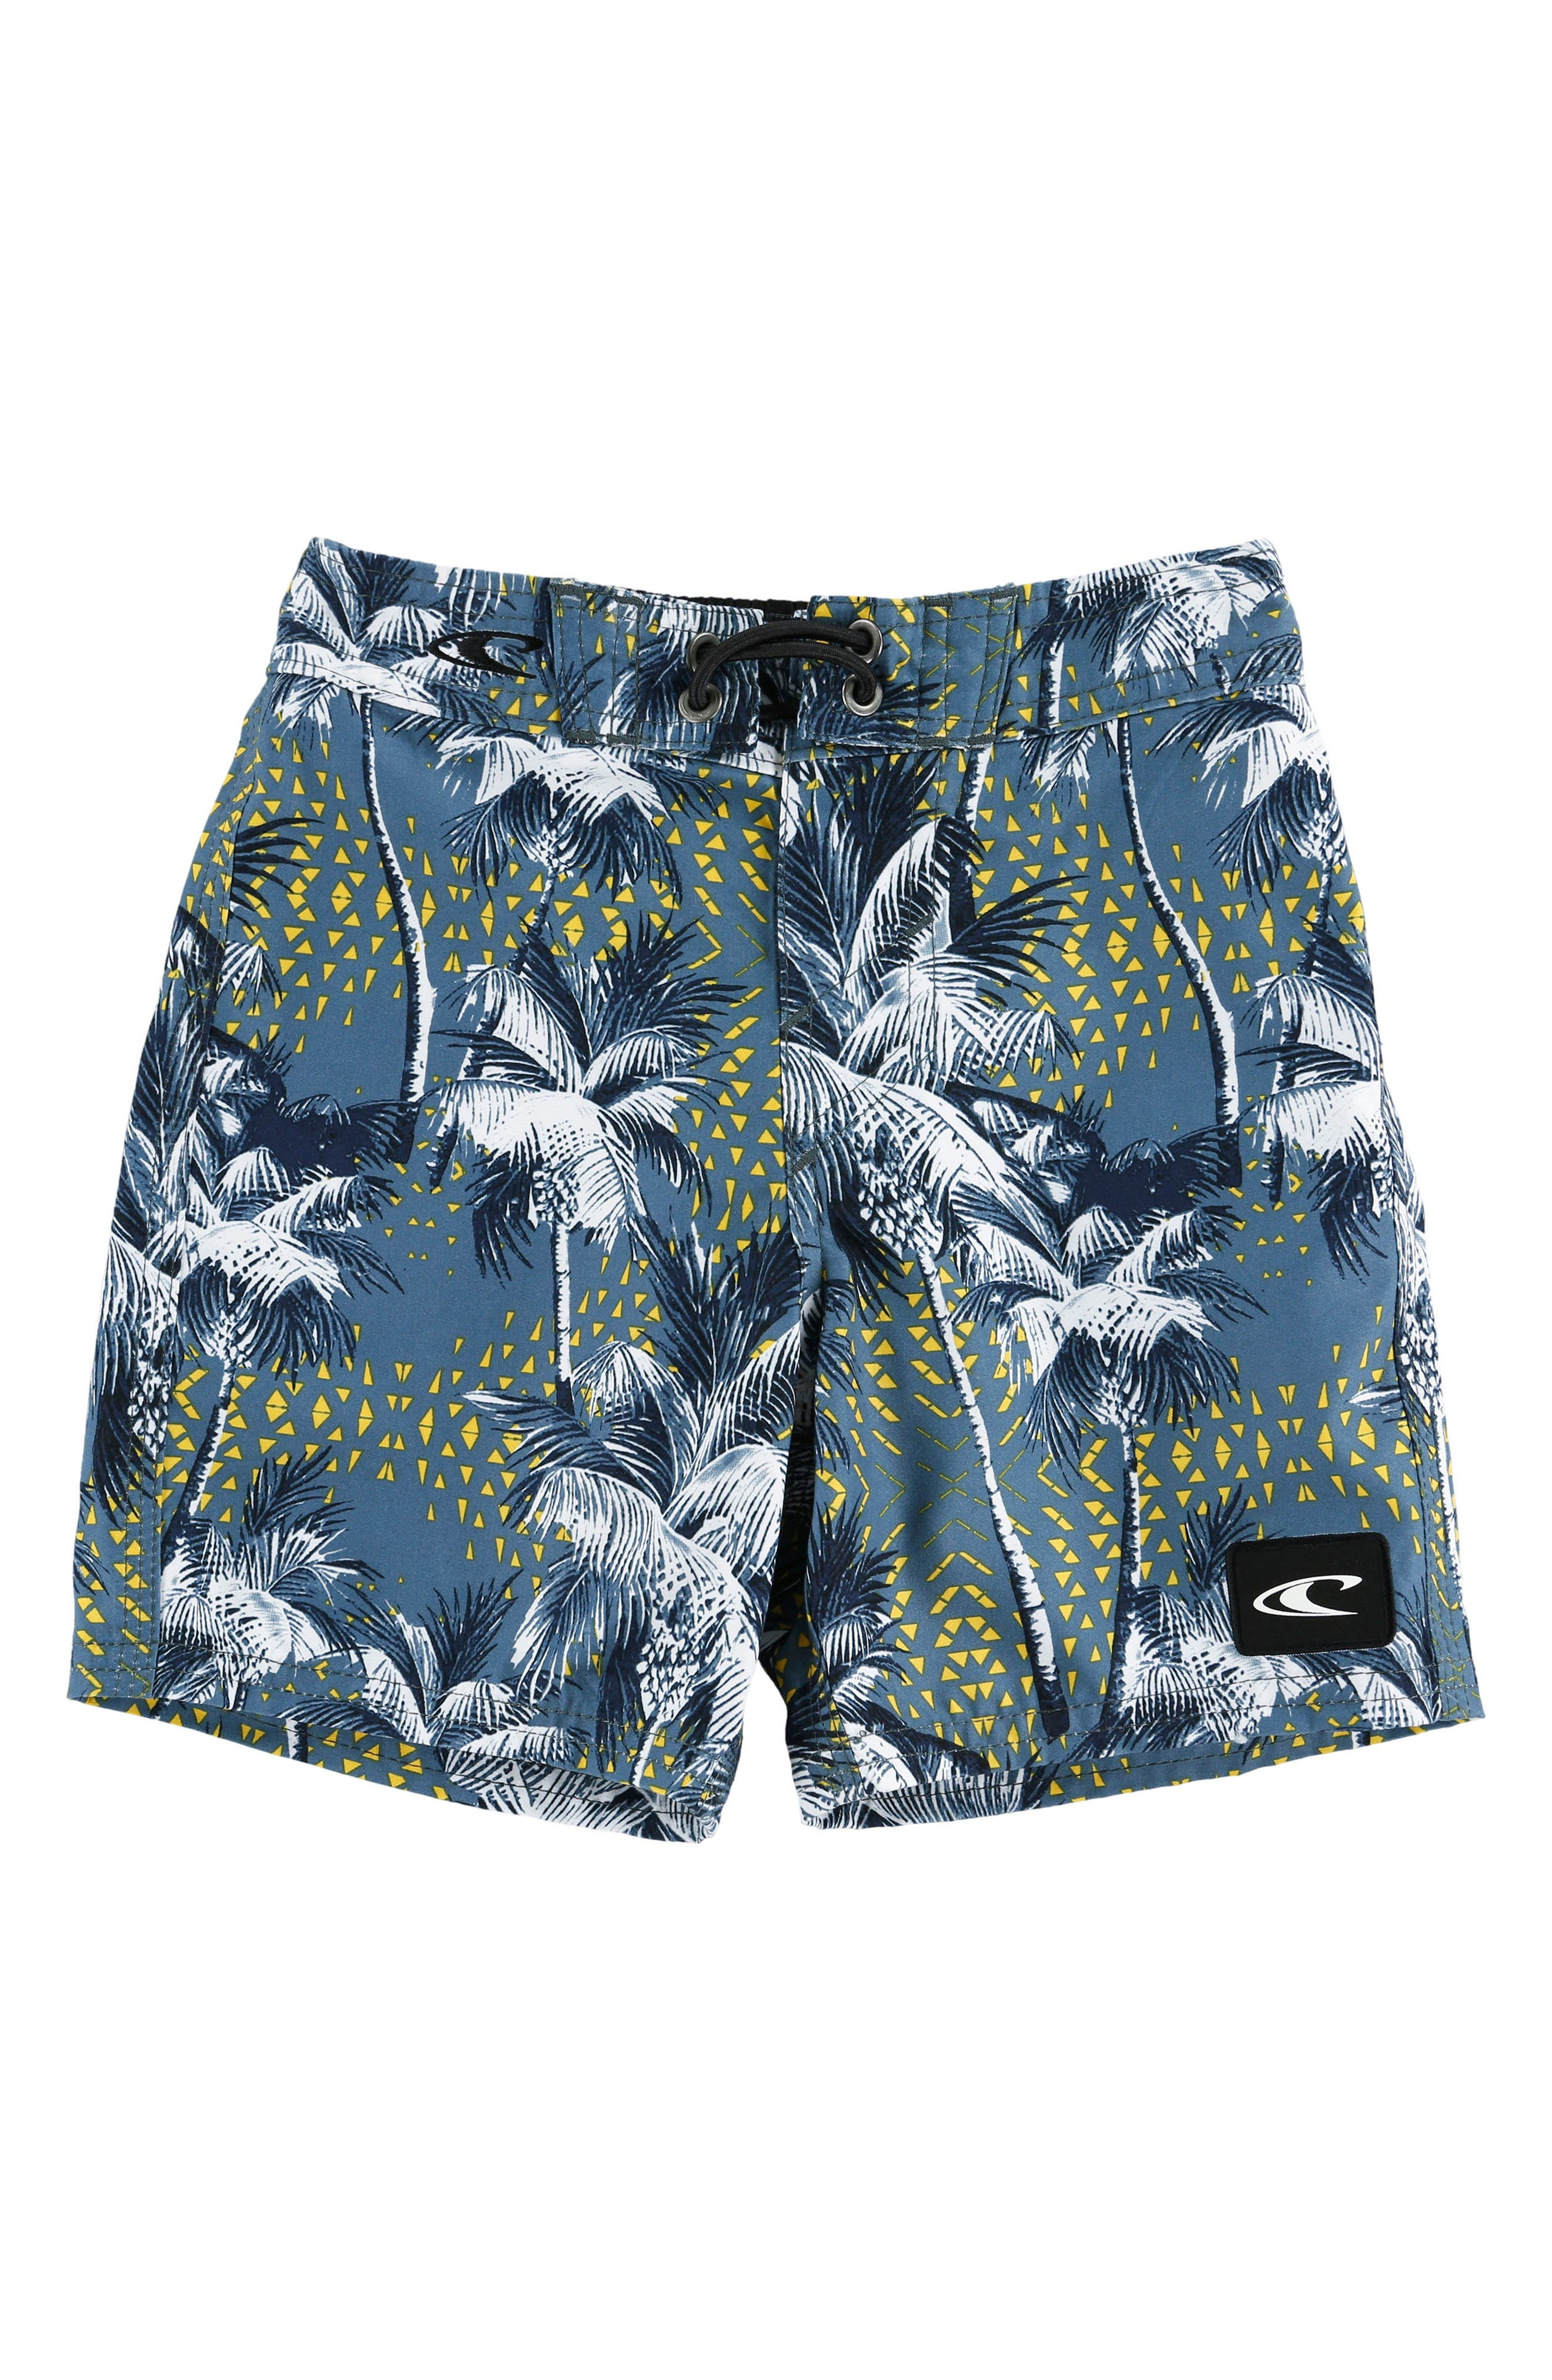 Darn Old Palmer Board Shorts,                             Main thumbnail 1, color,                             DUST BLUE